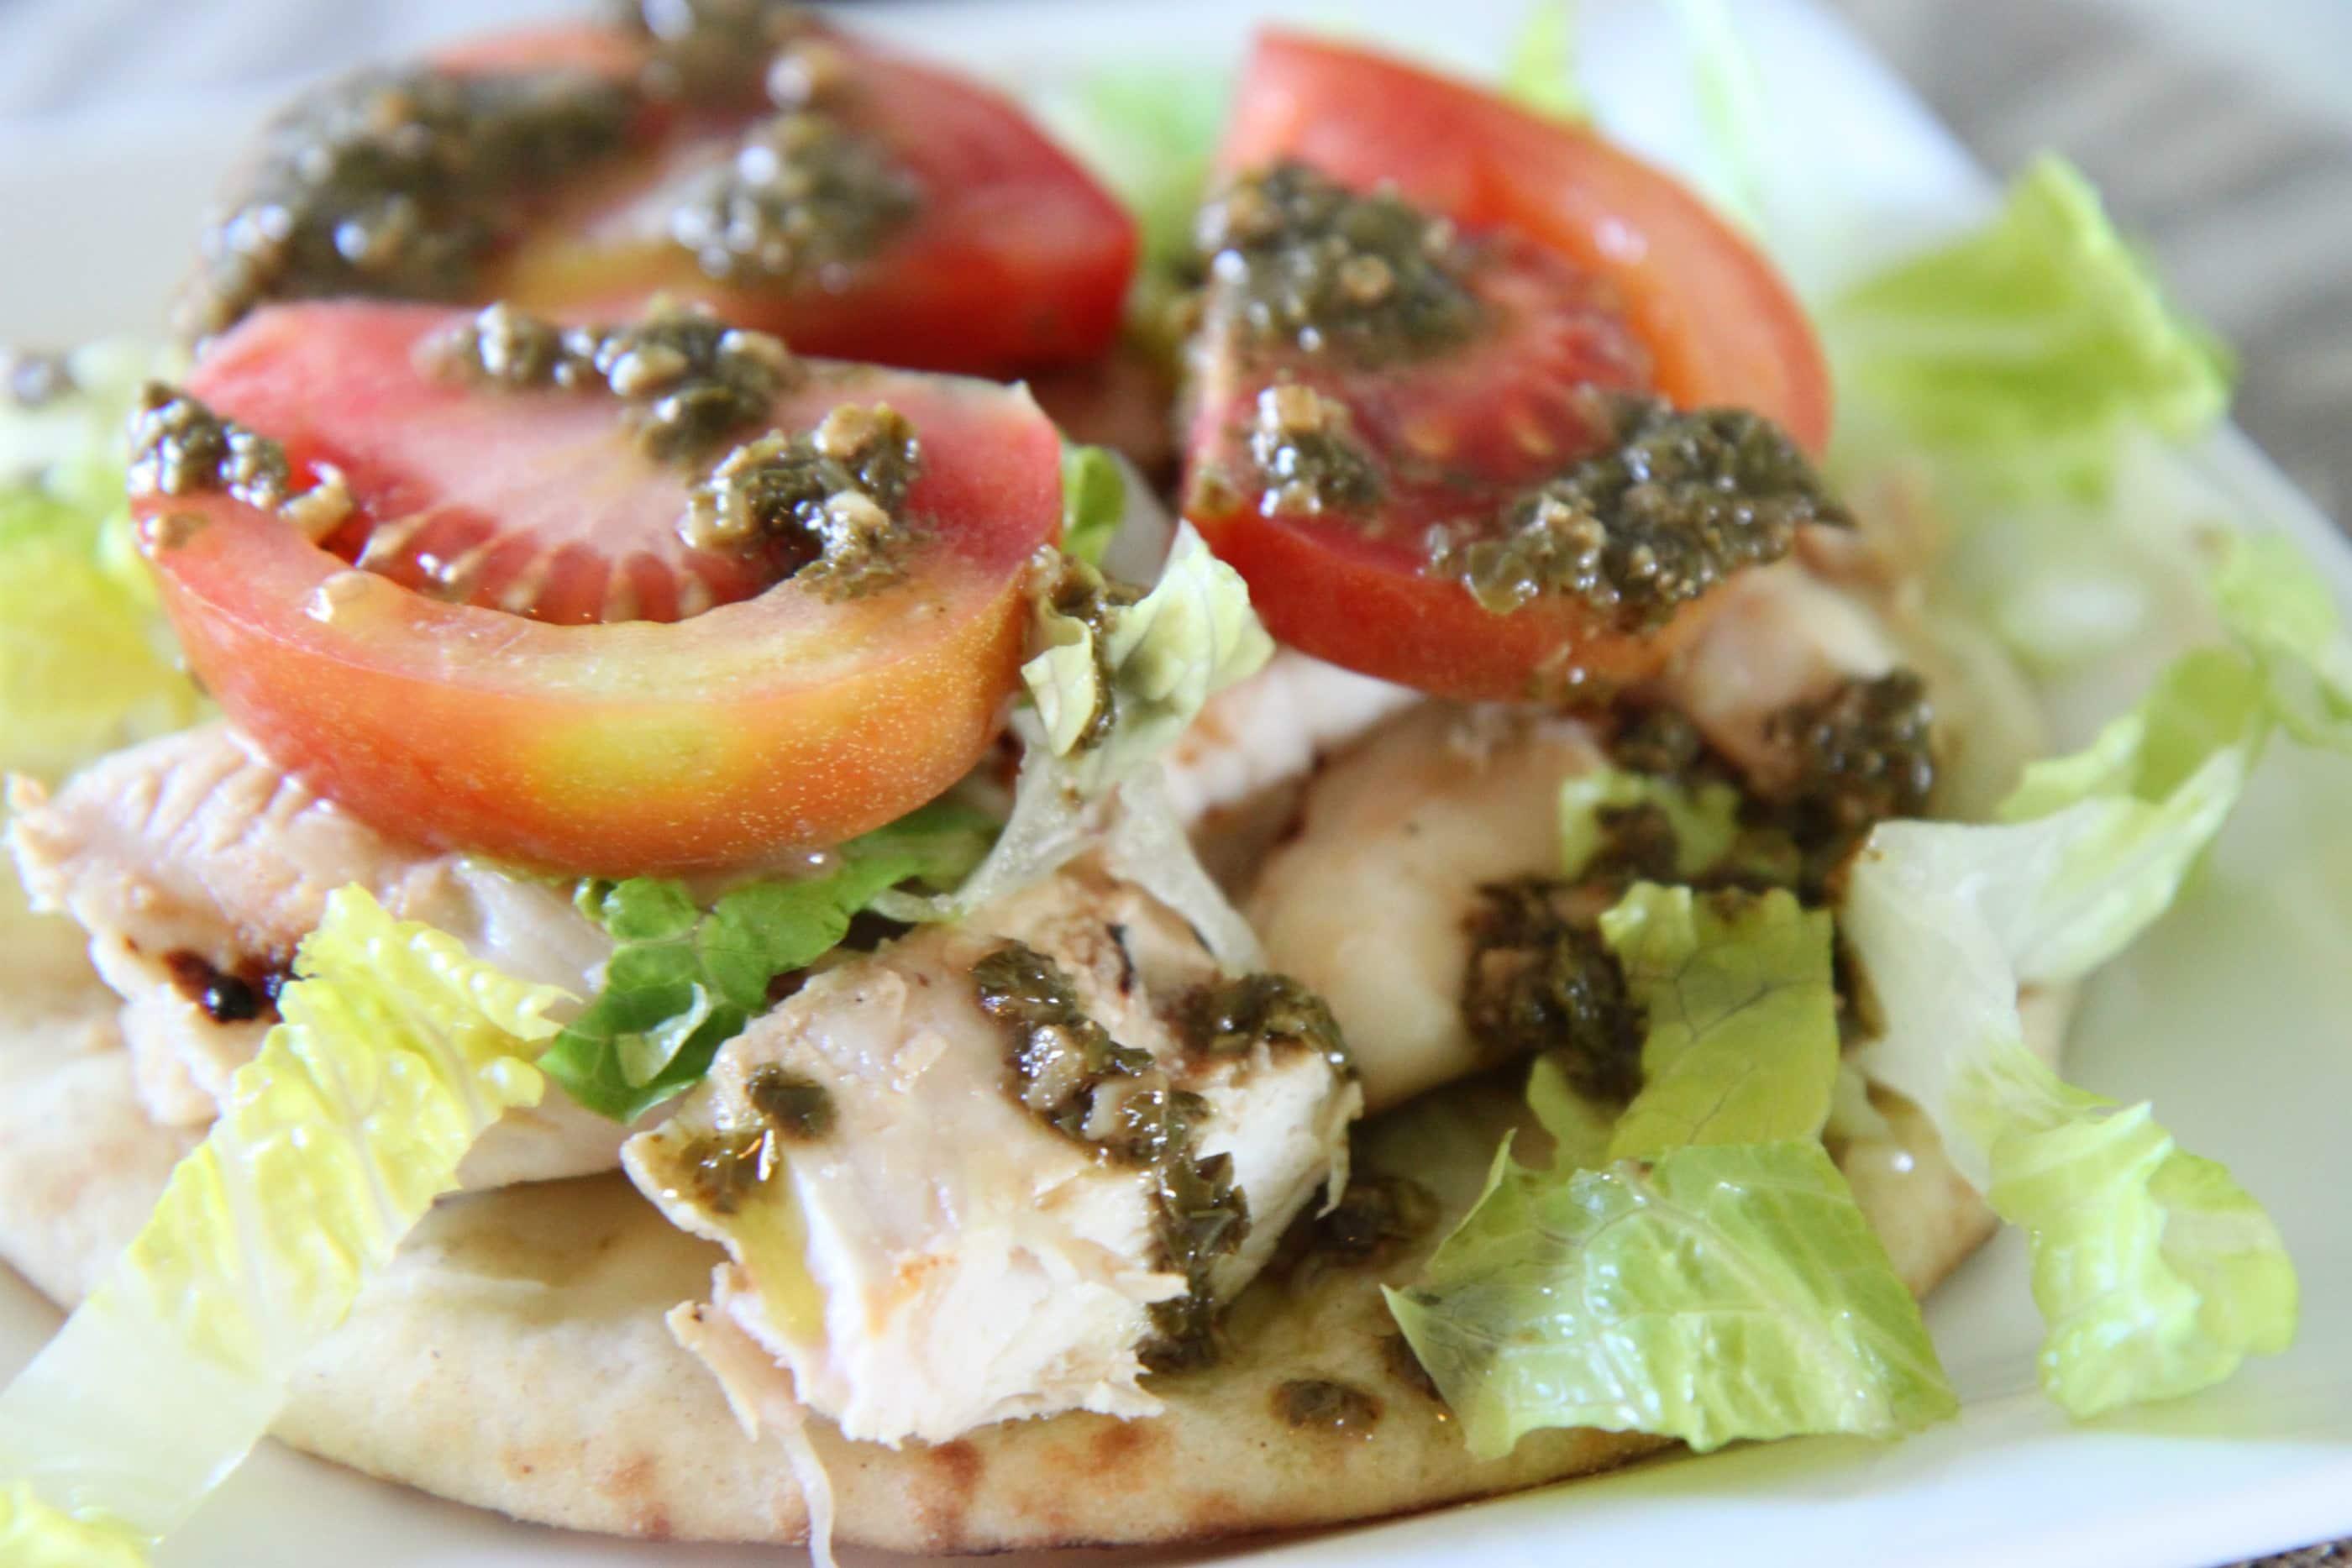 ... momadvice.com/blog/2012/04/chicken-pesto-open-faced-flatbread-sandwich